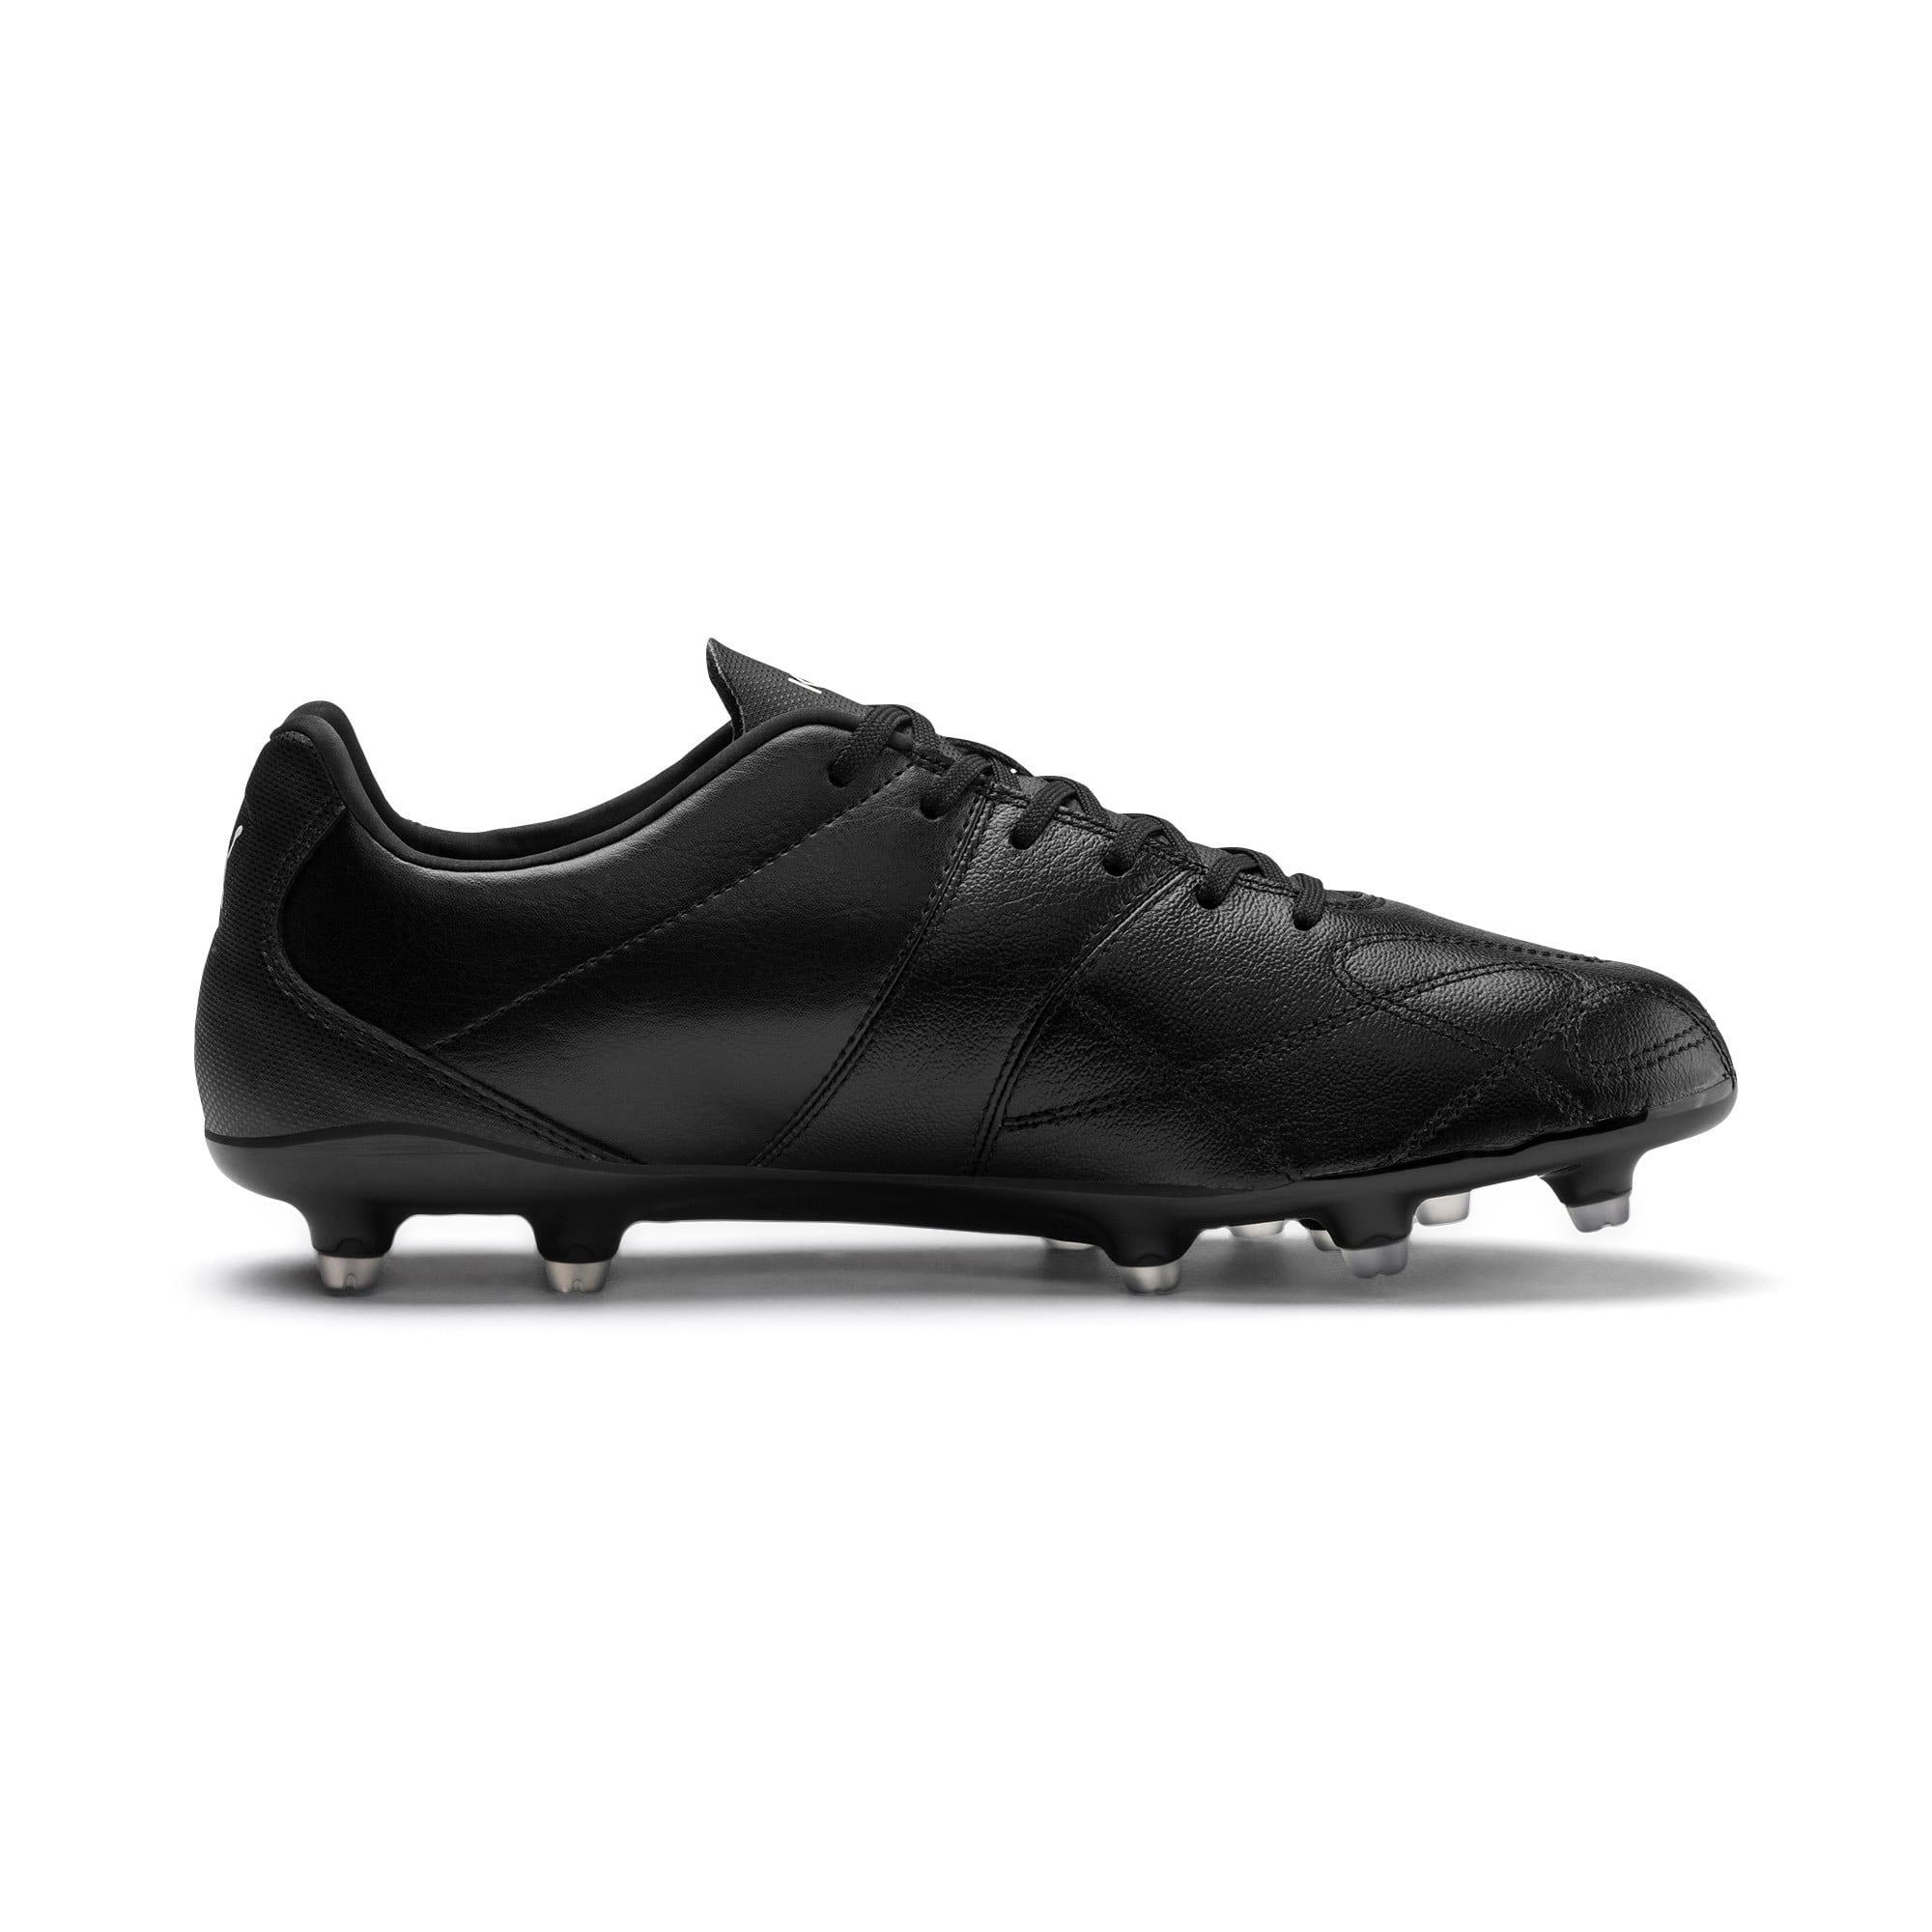 Thumbnail 7 of KING Hero FG Football Boots, Puma Black-Puma White, medium-IND